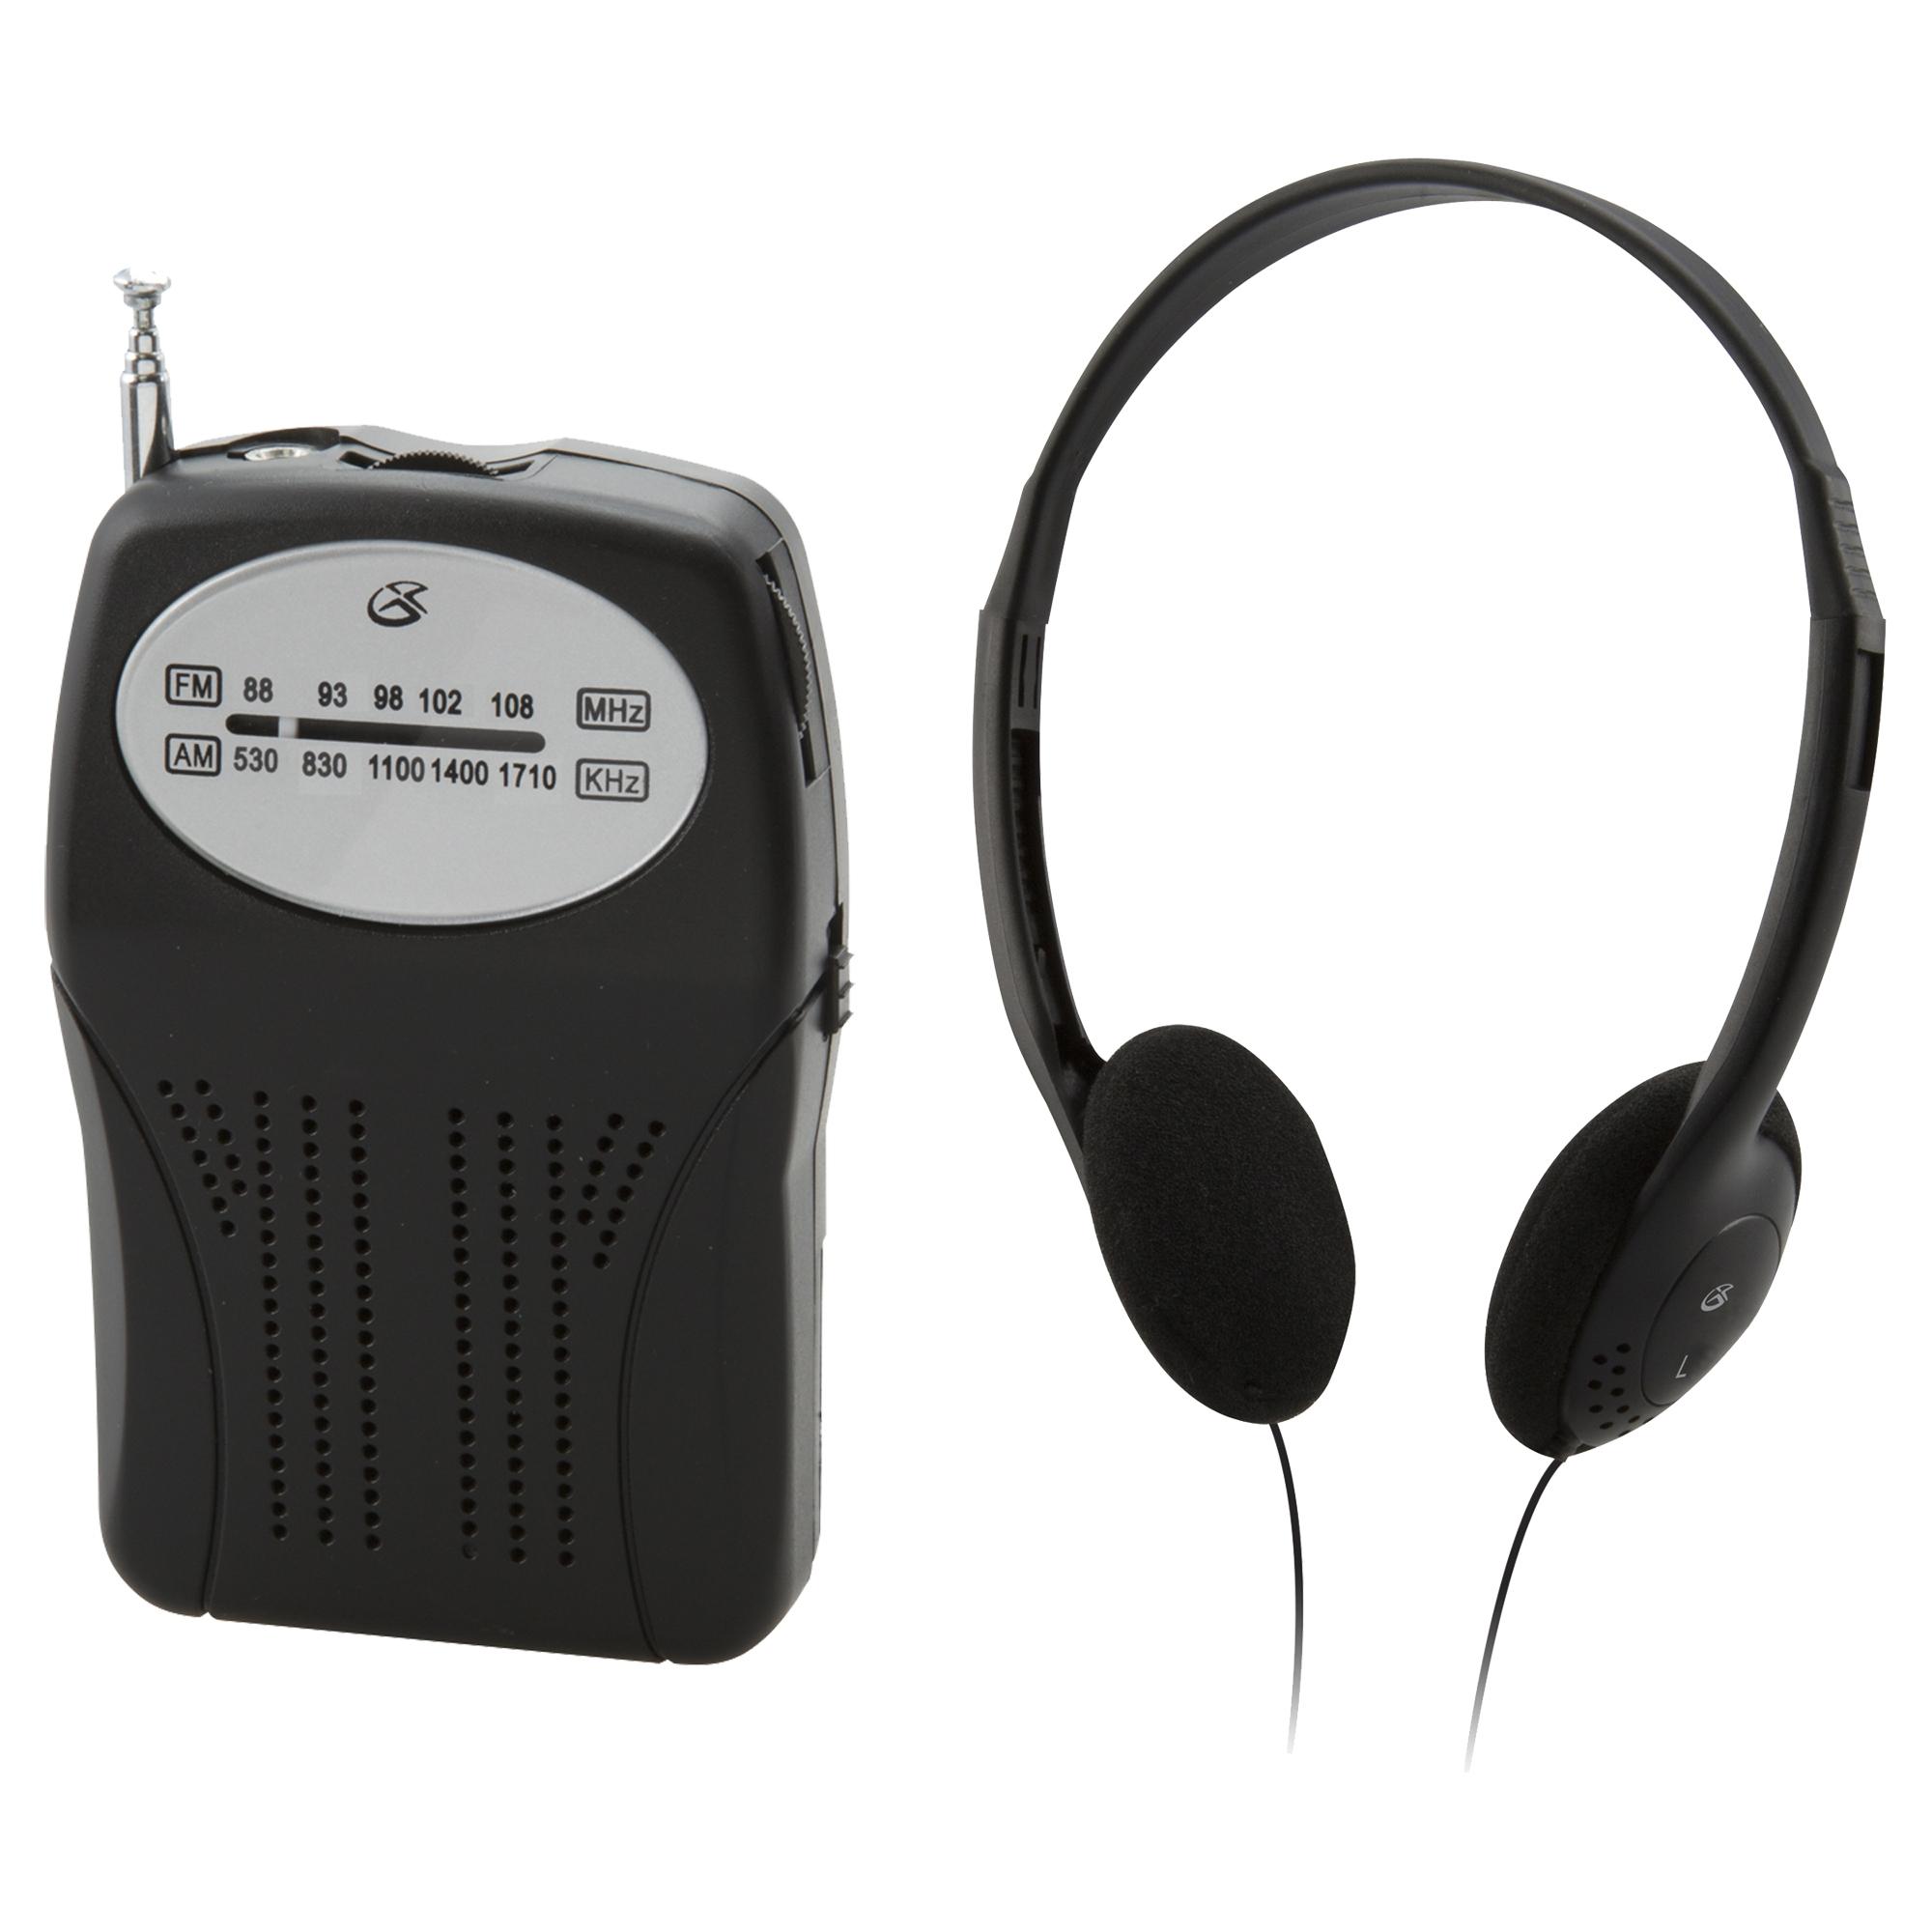 GPX Portable Handheld AM/FM Radio with Headphones